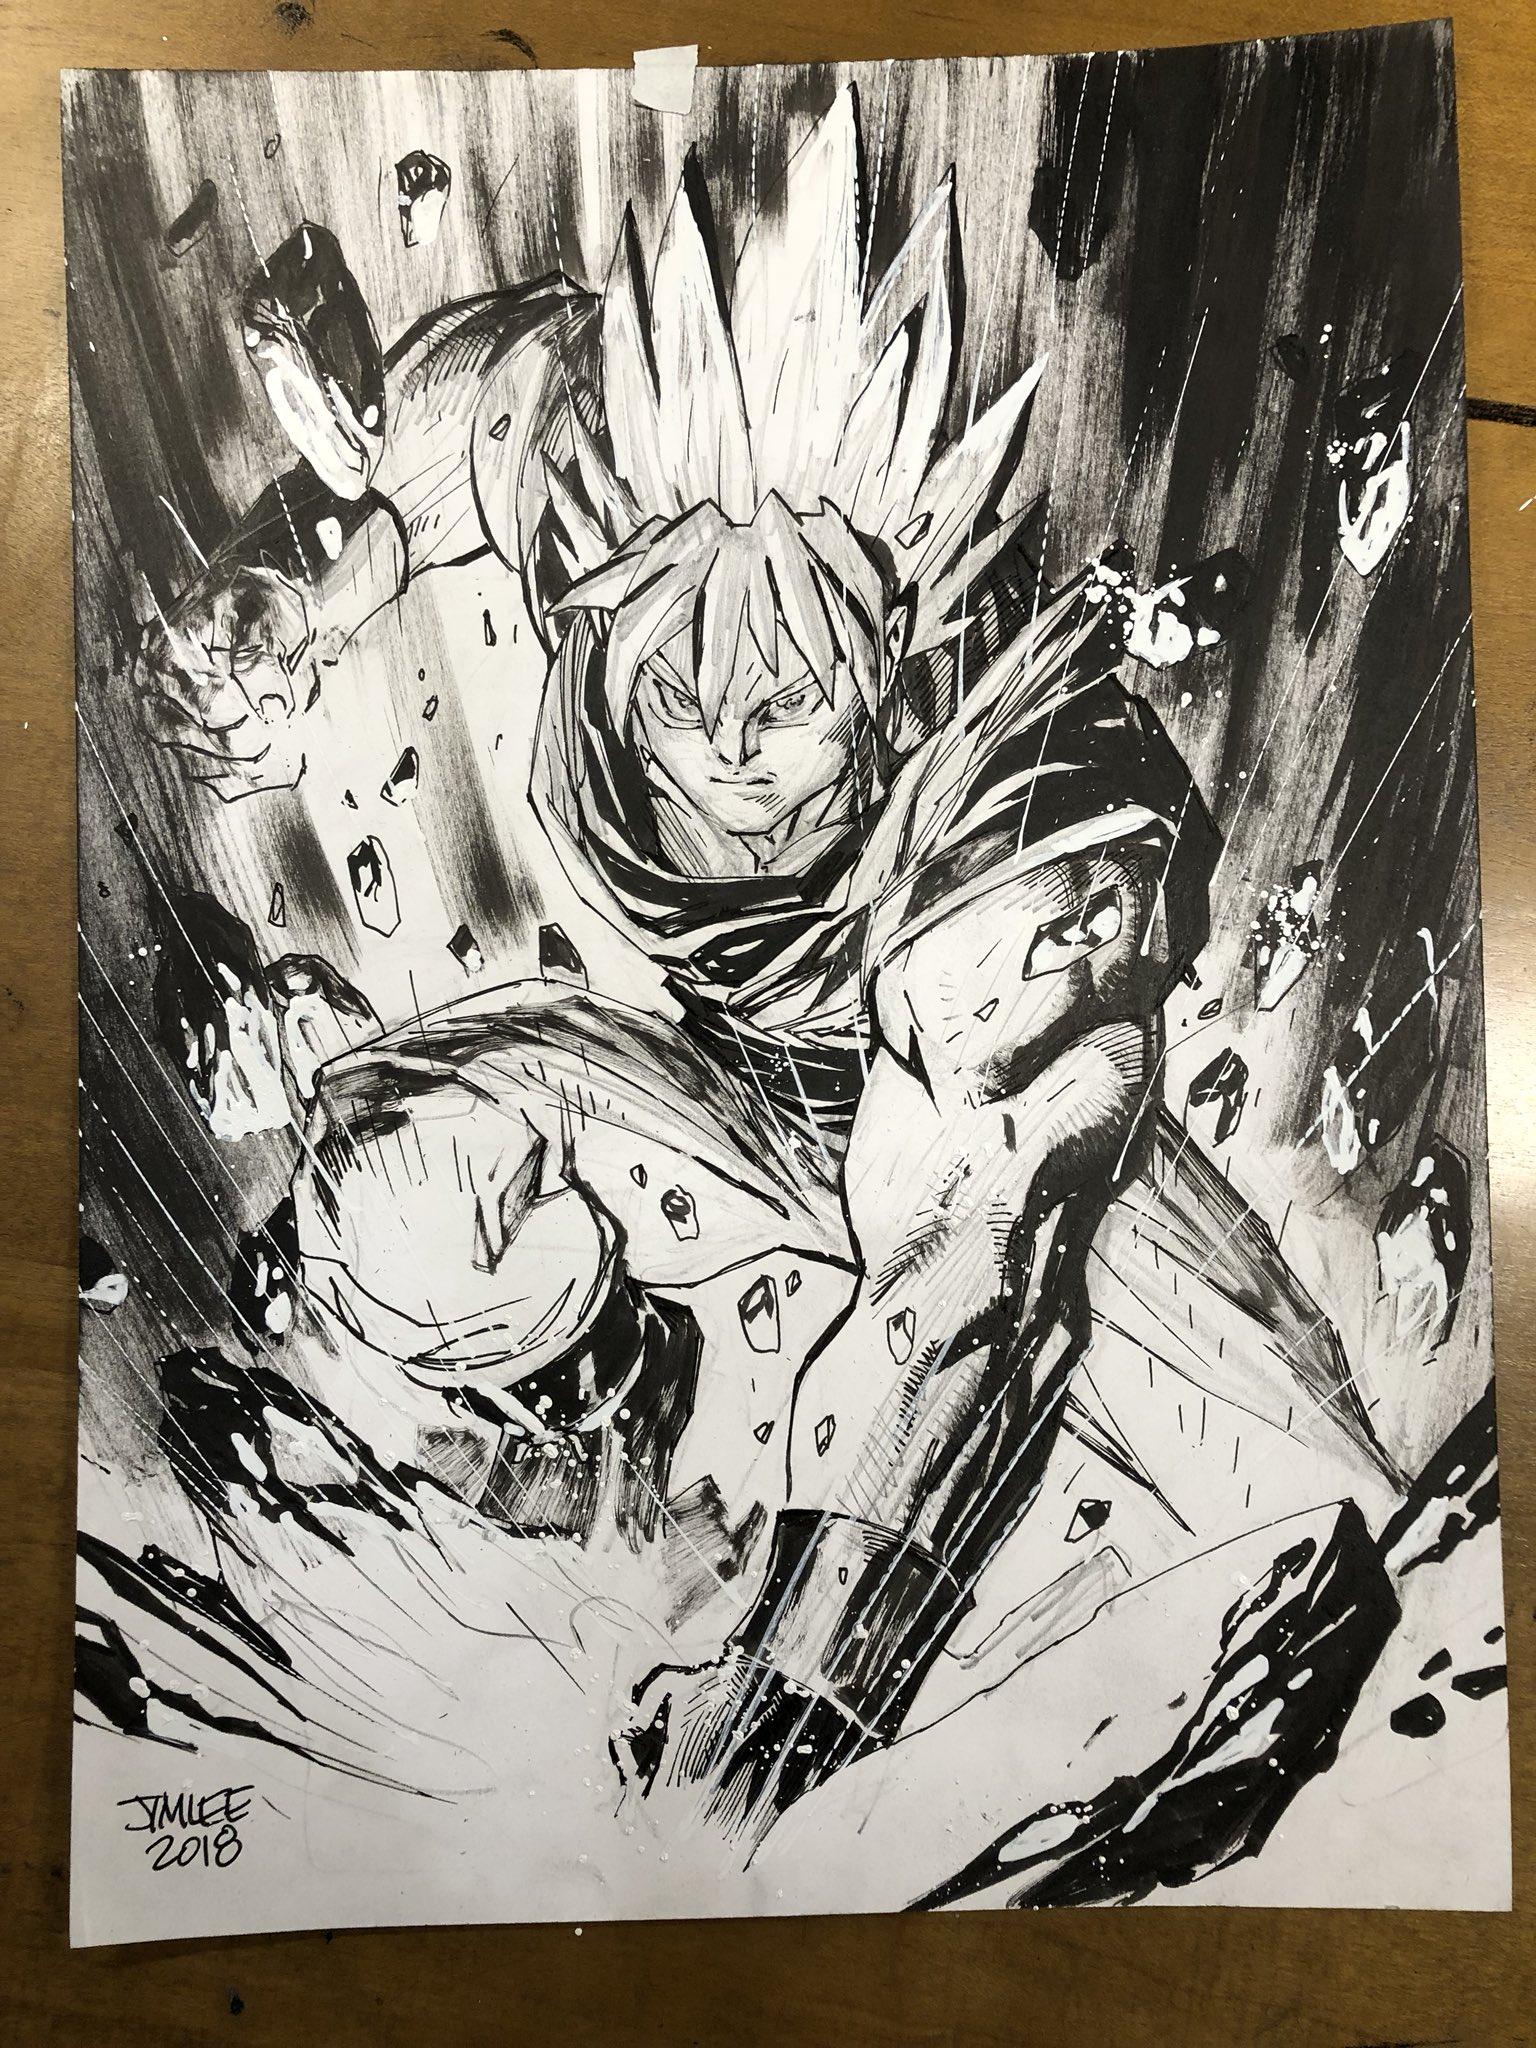 jim lee dc comics artist editor draws son gokuu kanzenshuu